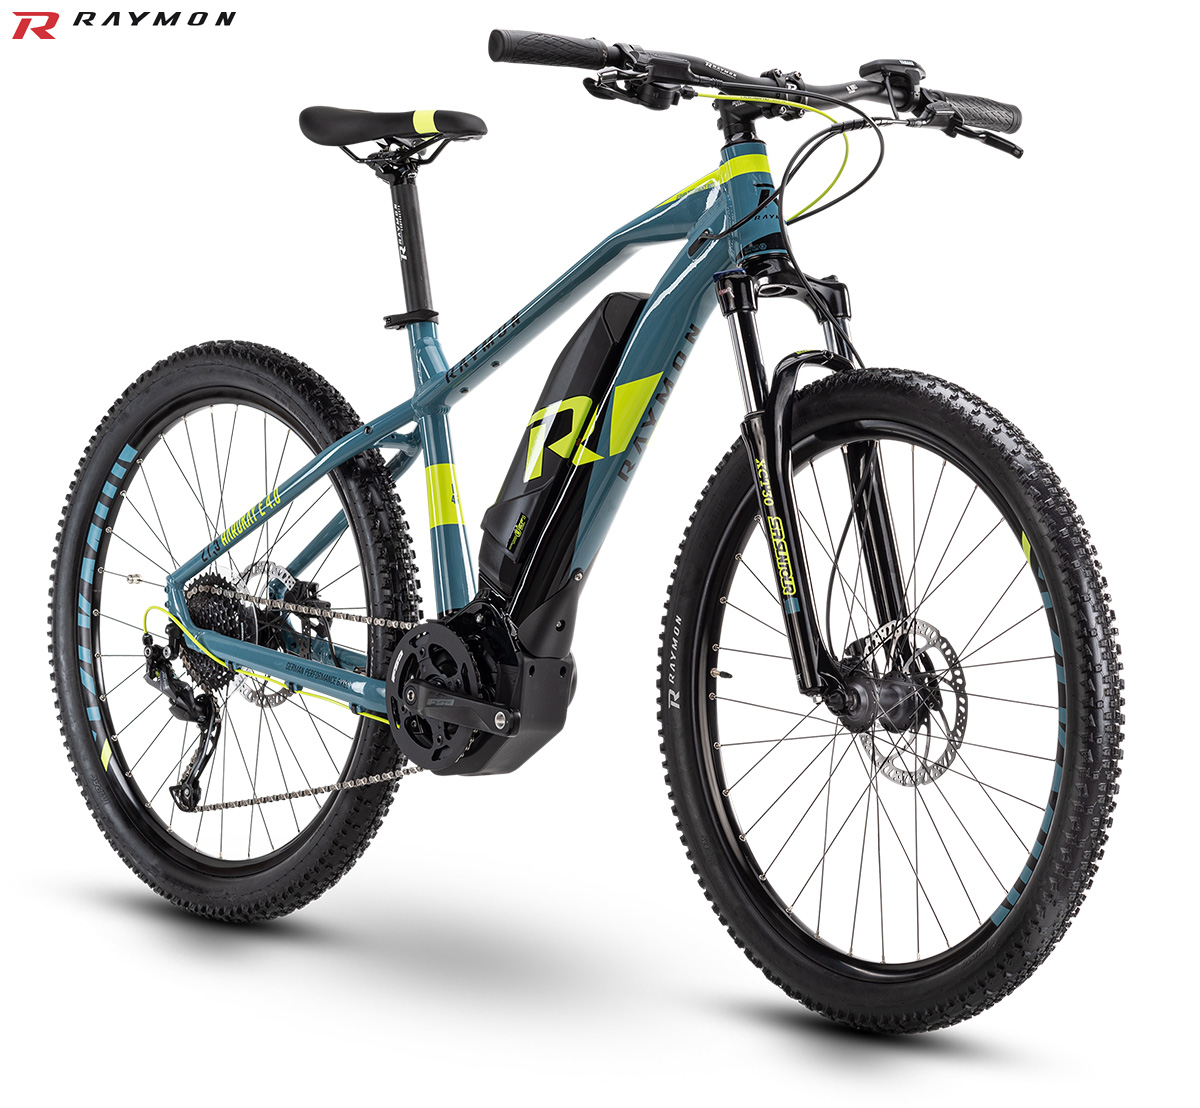 Una mountain bike hardtail elettrica R raymon HardRay E-Nine 4.0 gamma 2020